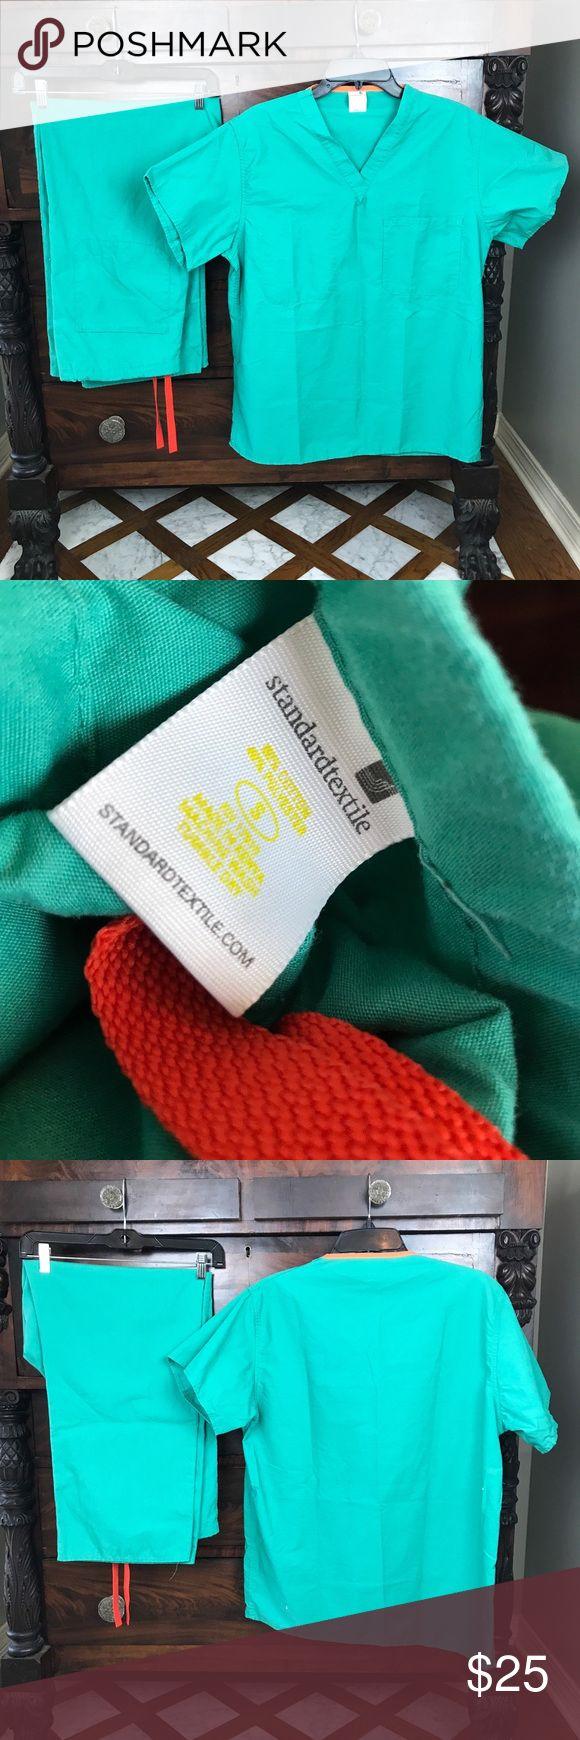 Standard textile scrubs set Teel and orange scrubs Size small Other